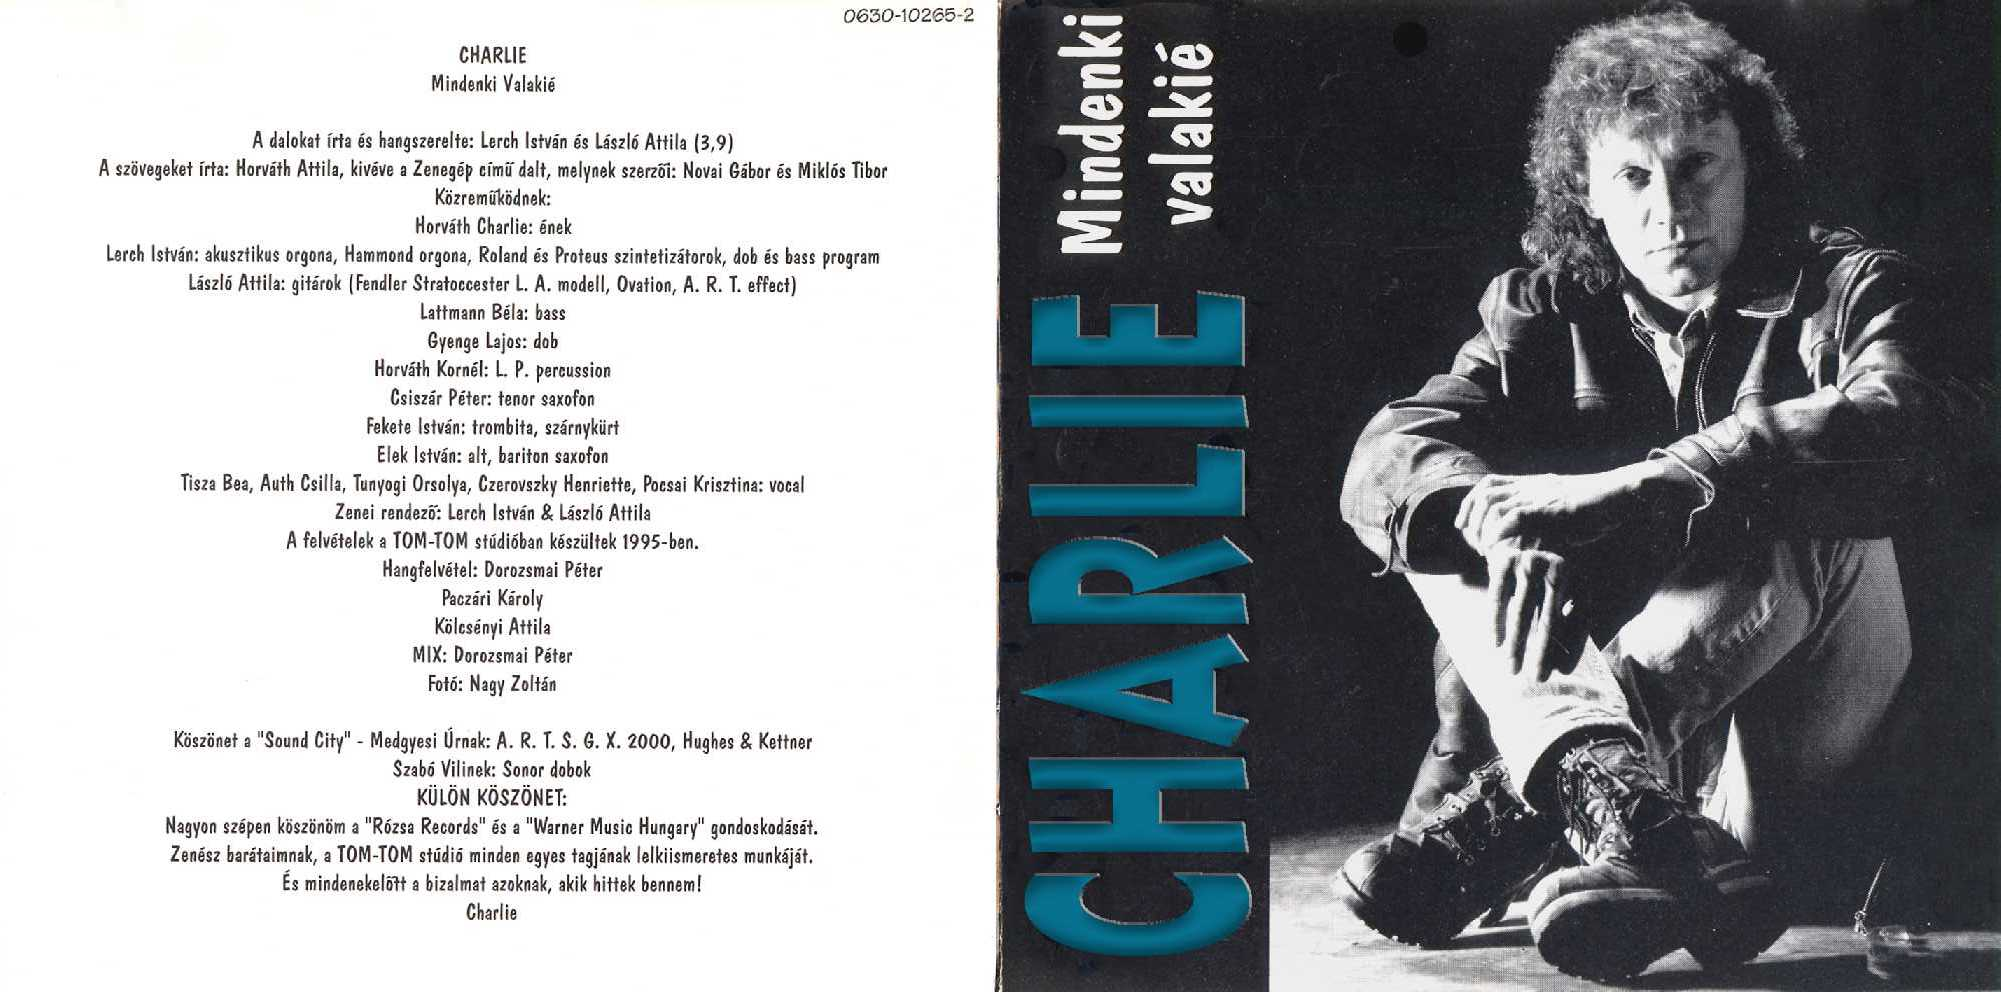 Charlie Mindenki valakié